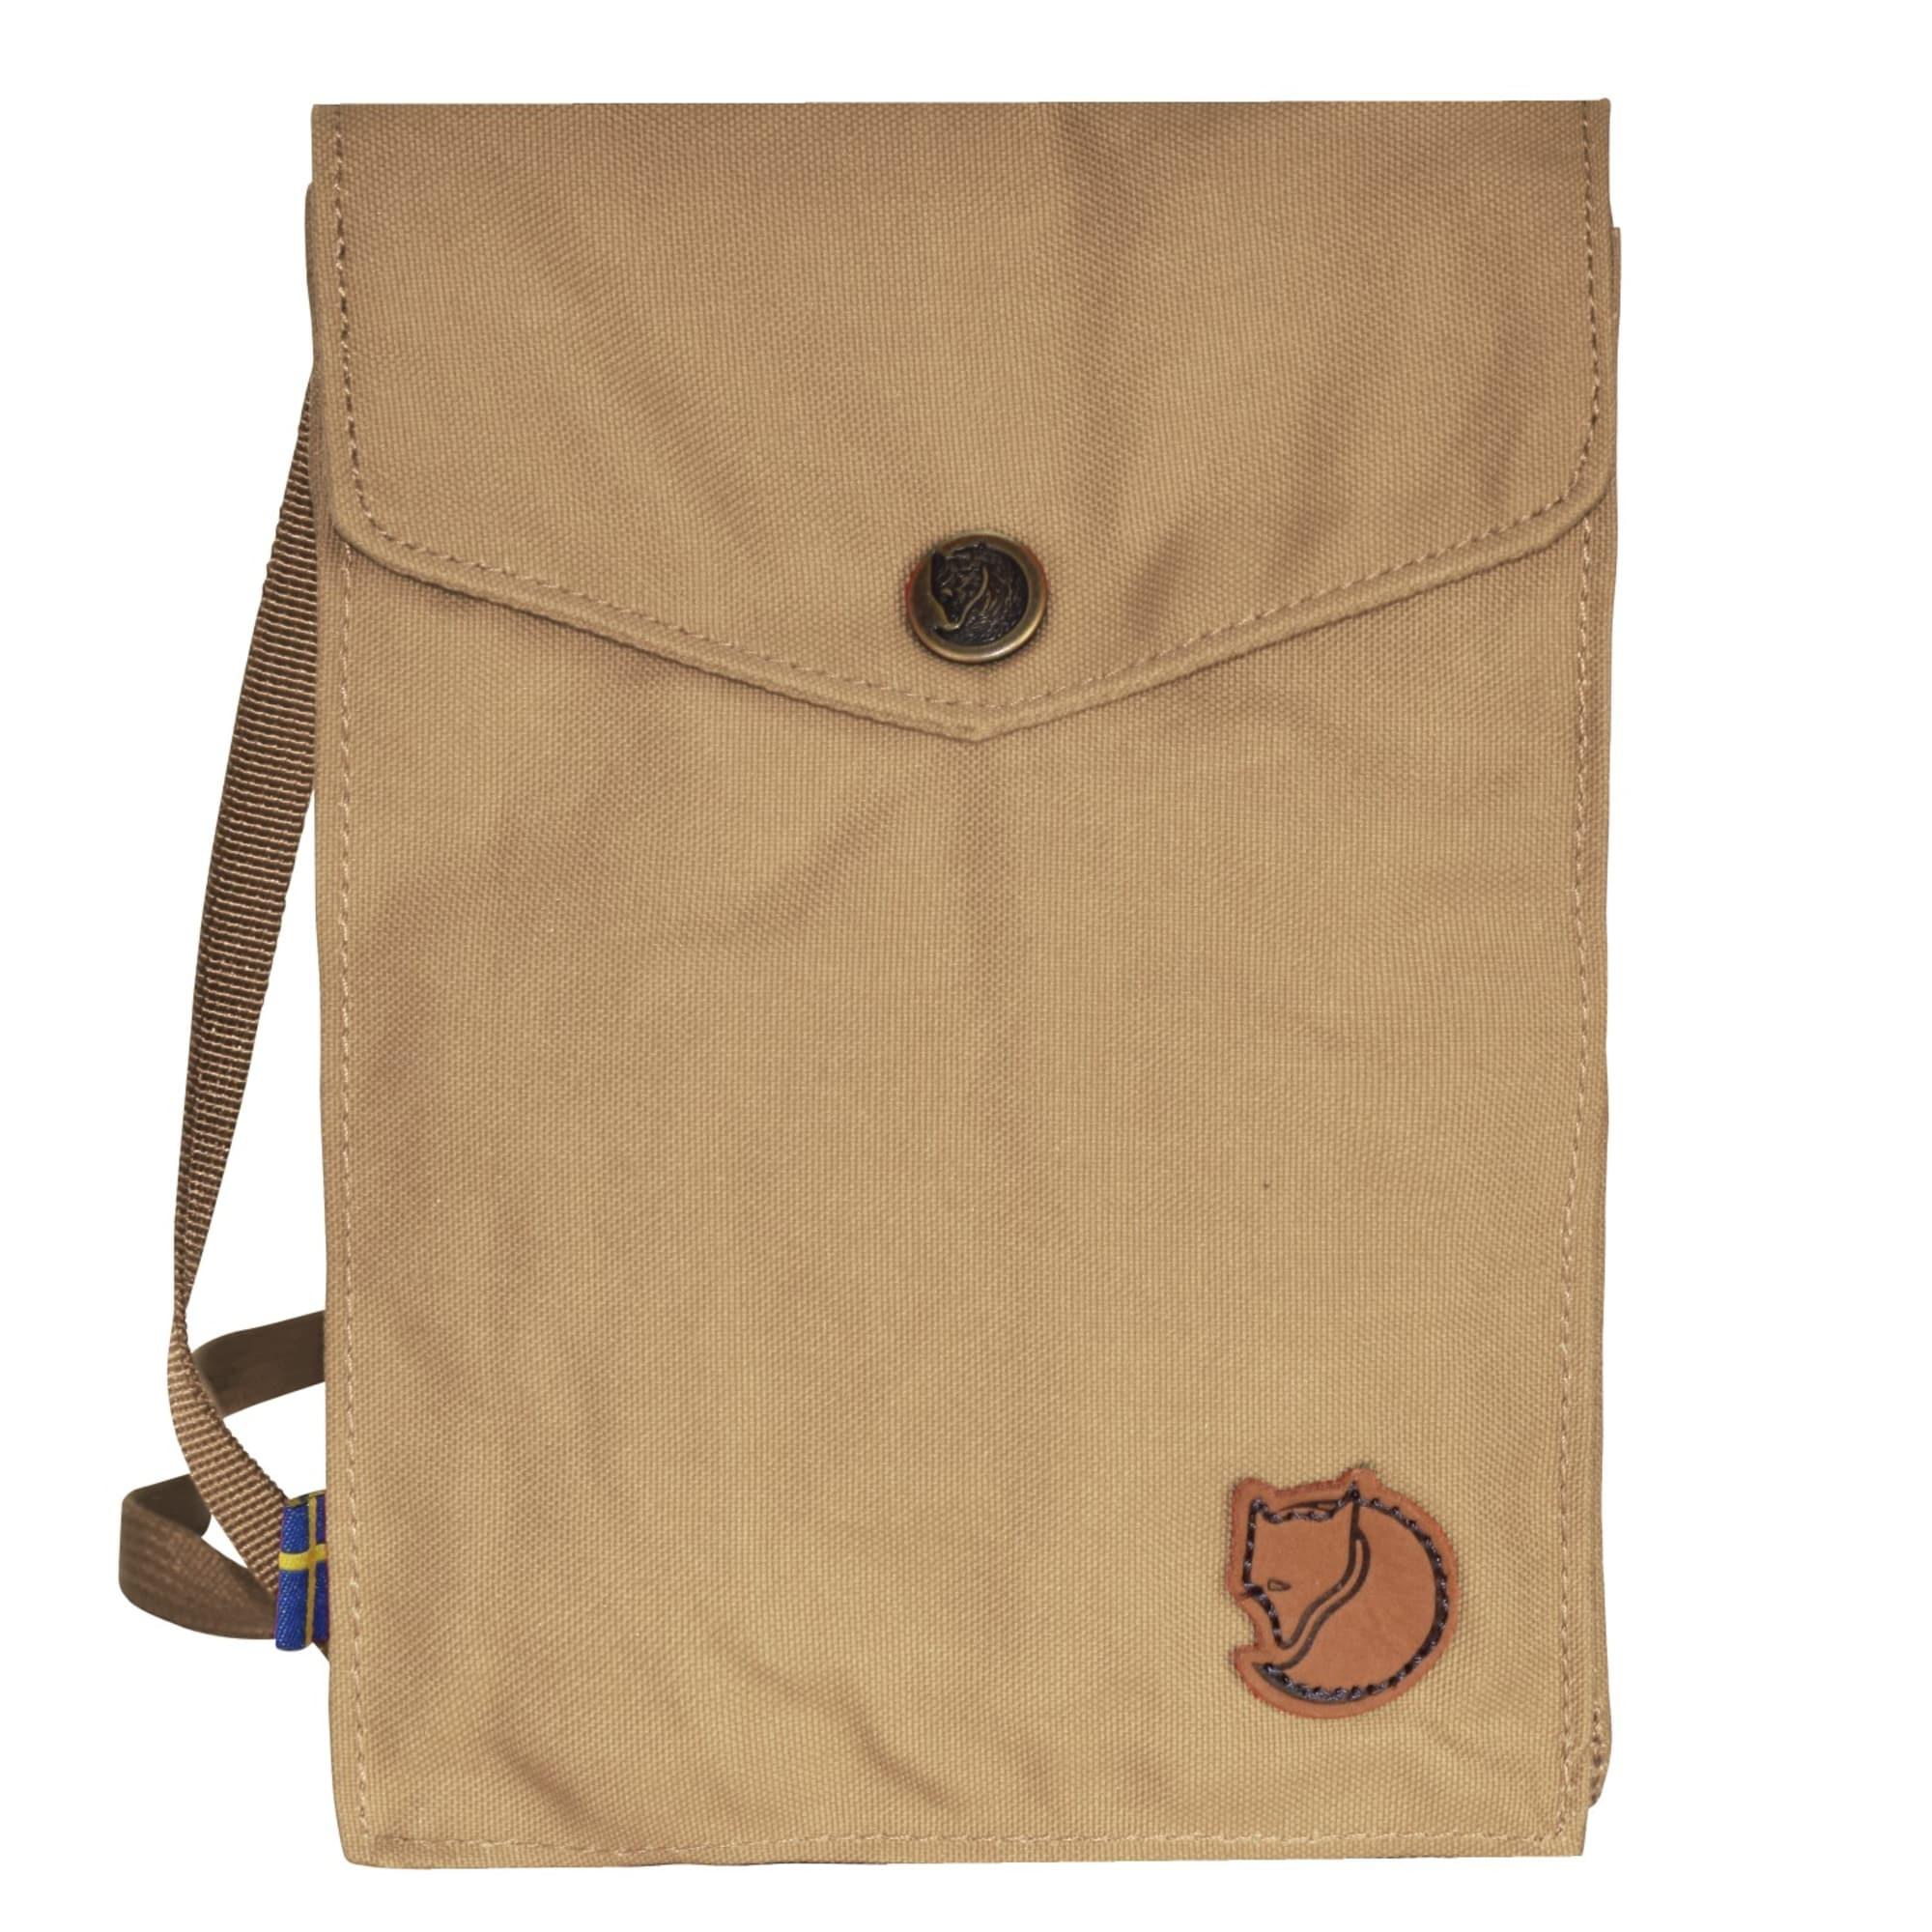 Pocket Brustbeutel 14 cm | Accessoires > Portemonnaies > Brustbeutel | Fjällräven